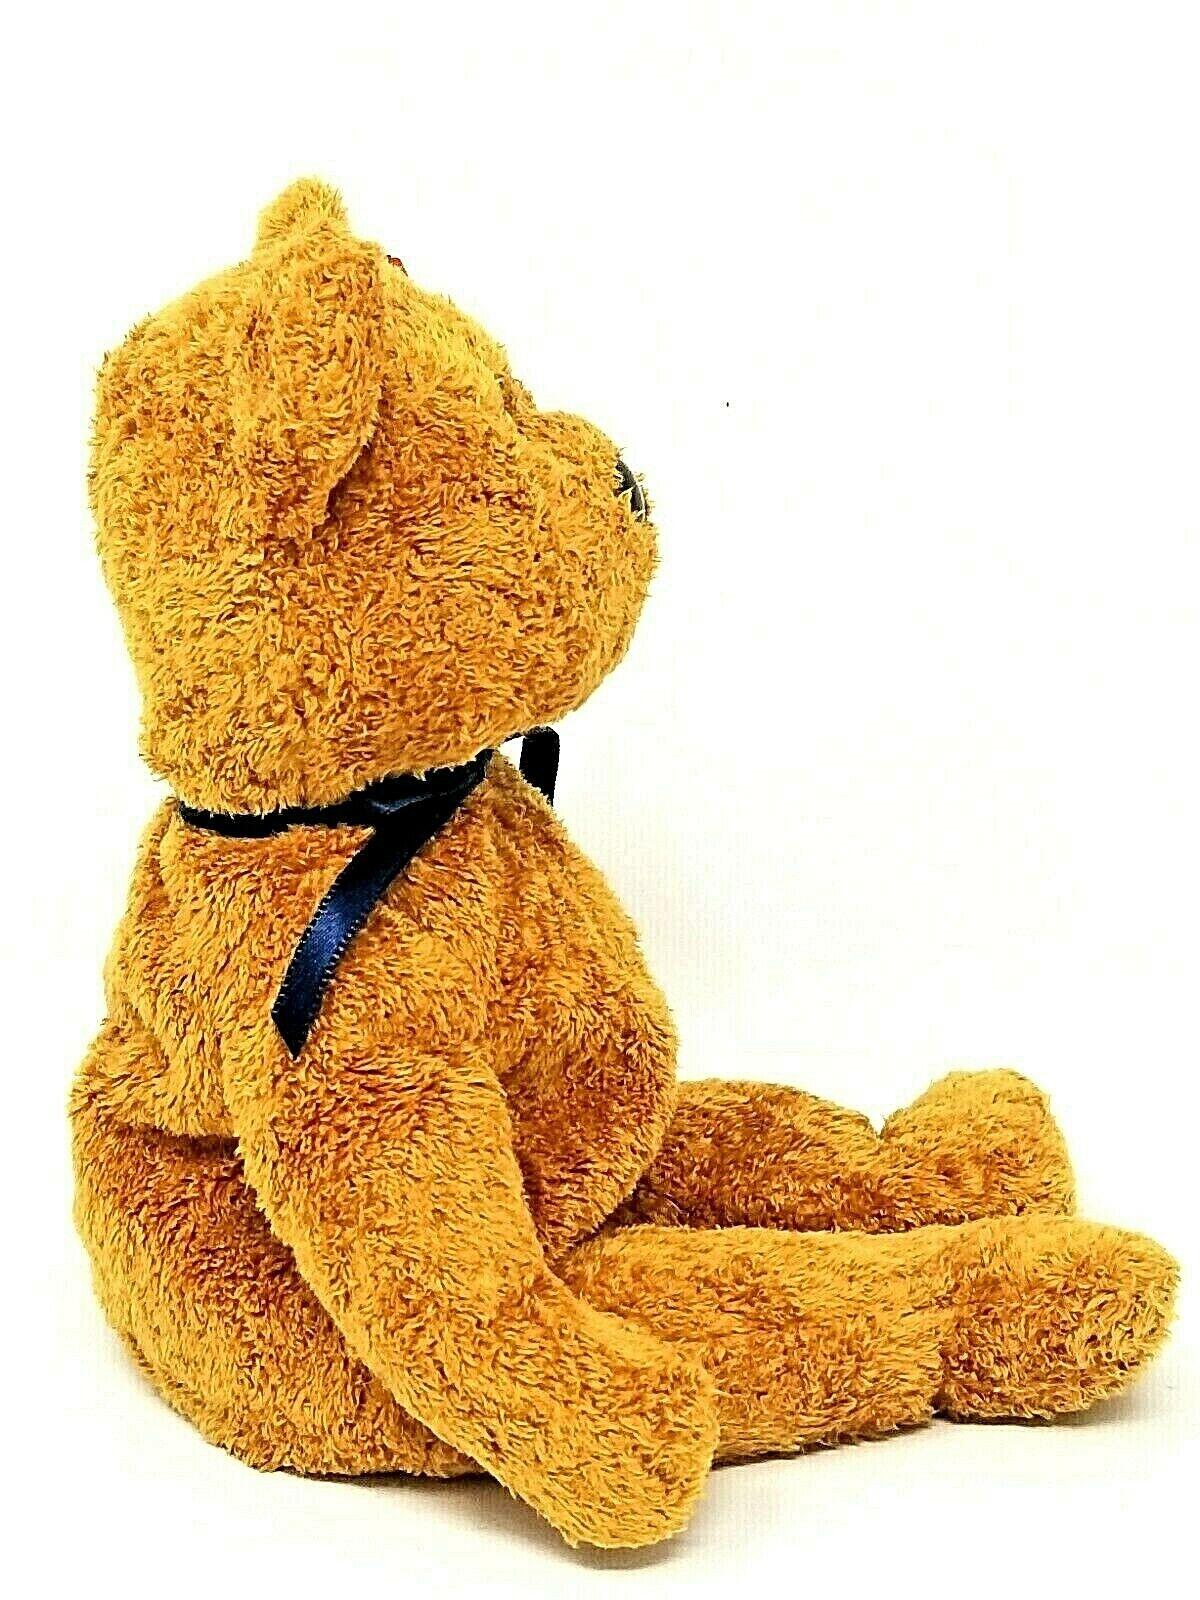 TY BEANIE BEANIE BEANIE BABY FUZZ THE NAPPY BROWN BEAR W ERRORS DATE OF BIRTH  JULY 23, 1998 750cd6